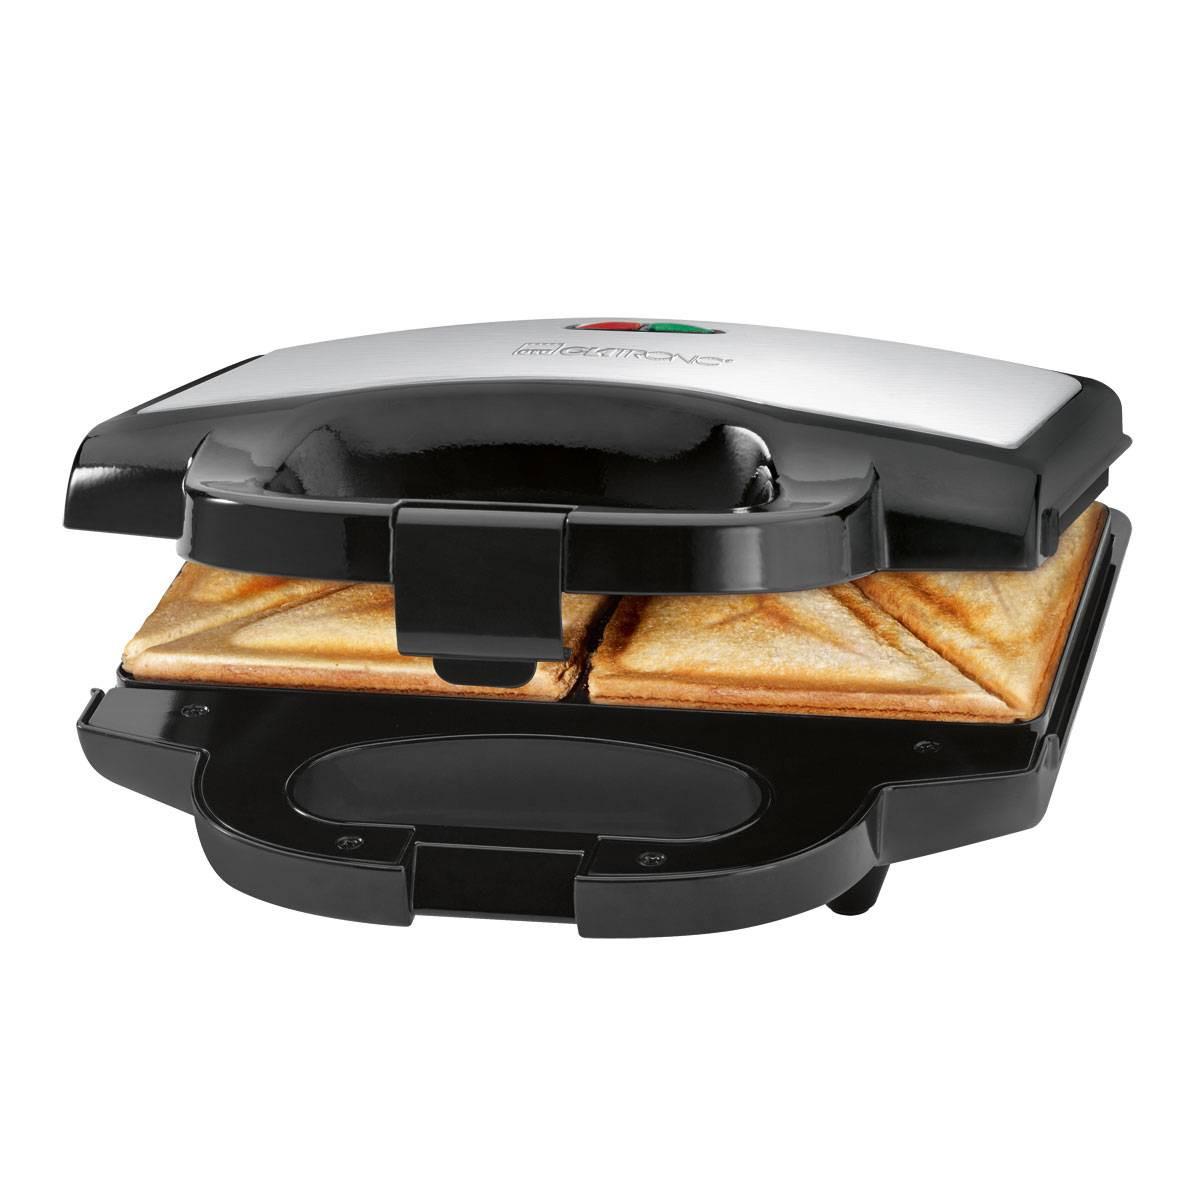 Clatronic Sandwichera ST 3628 Negra / Inox